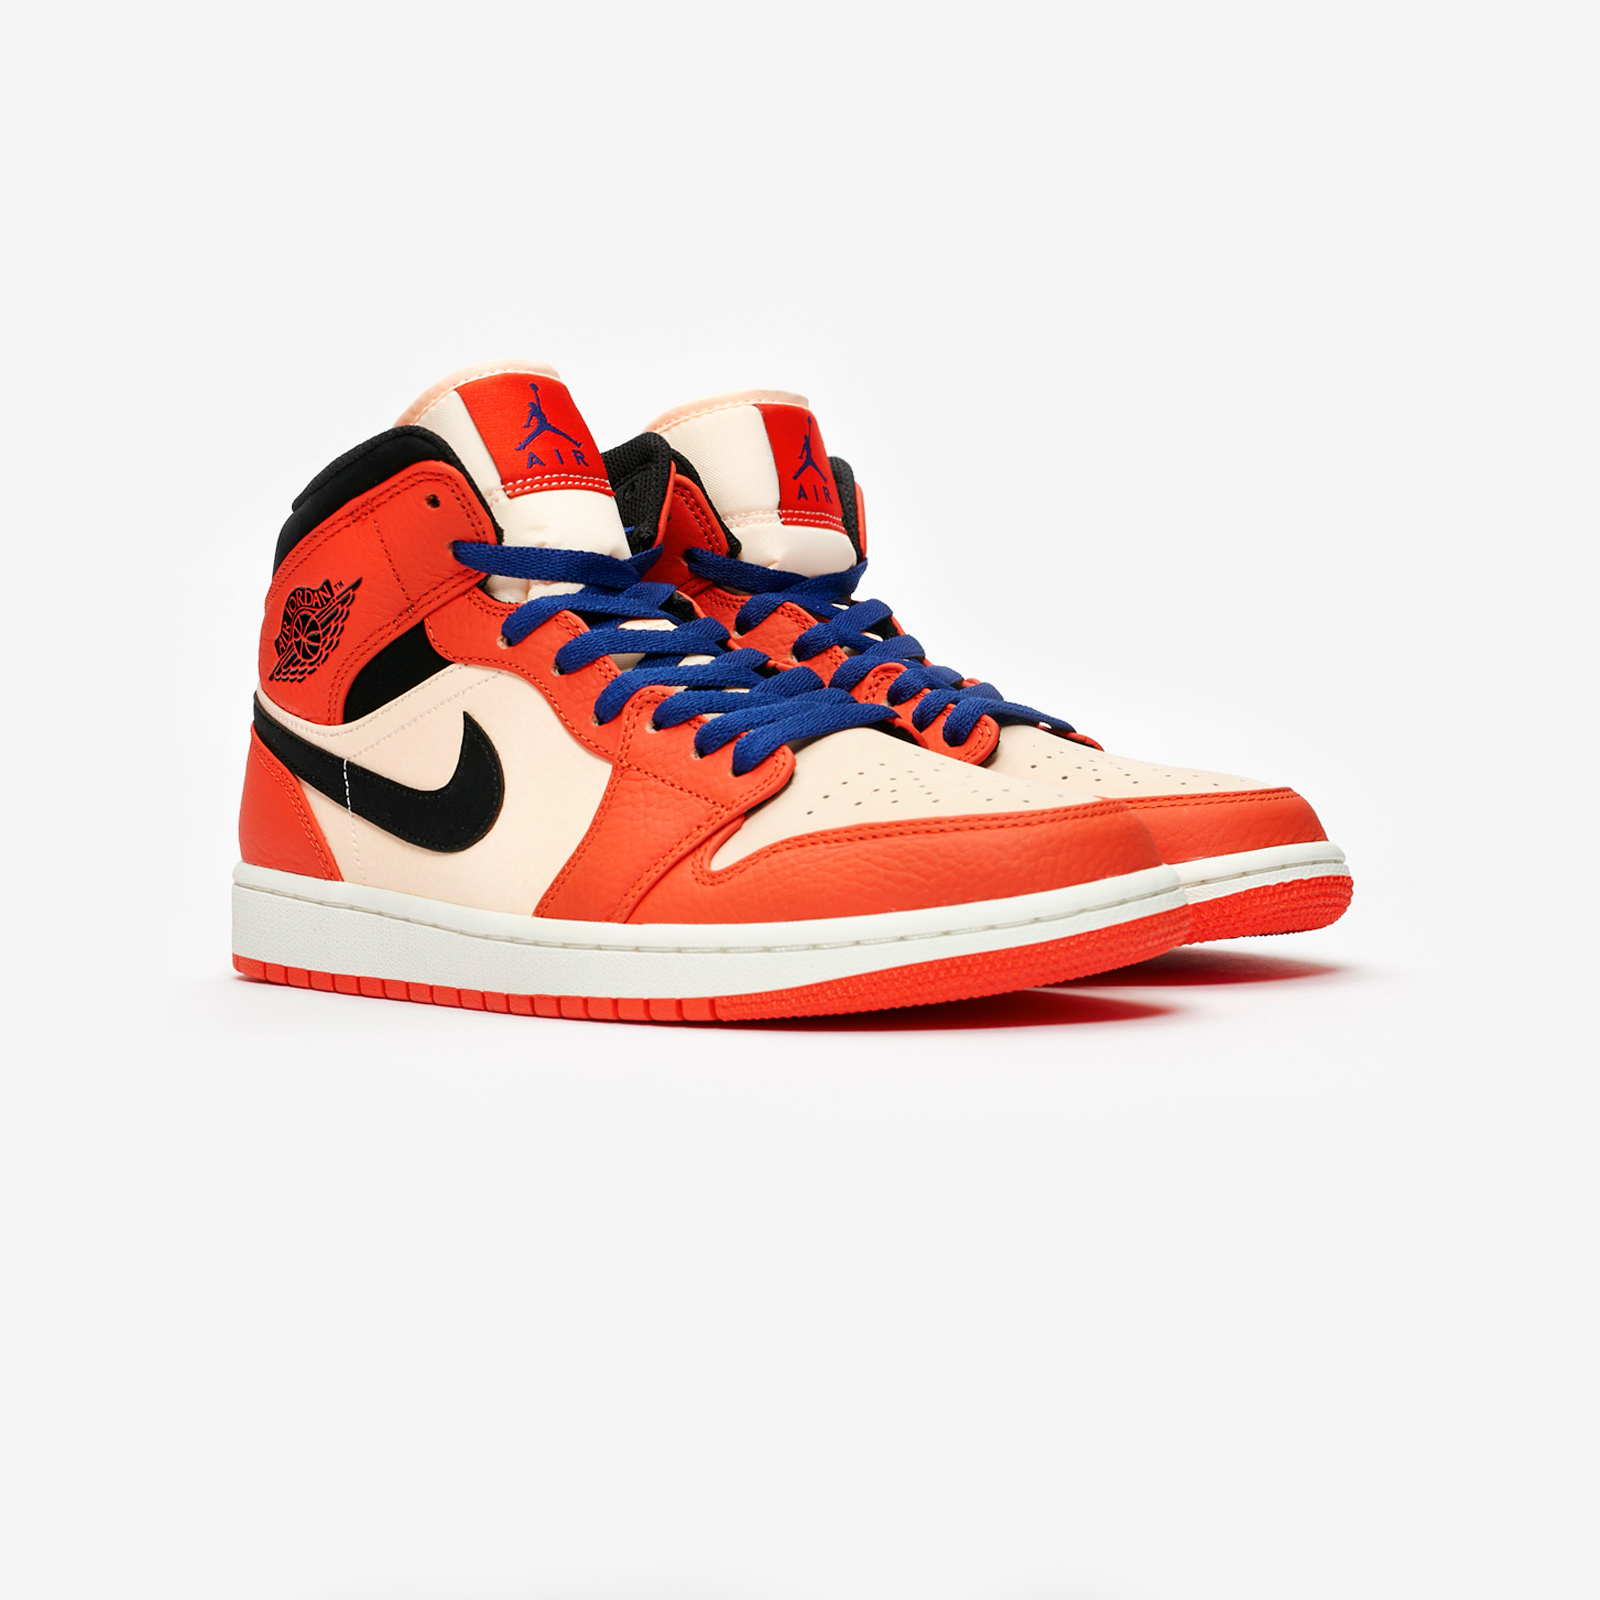 01034420590 Jordan Brand Air Jordan 1 Mid SE - 852542-800 - Sneakersnstuff ...